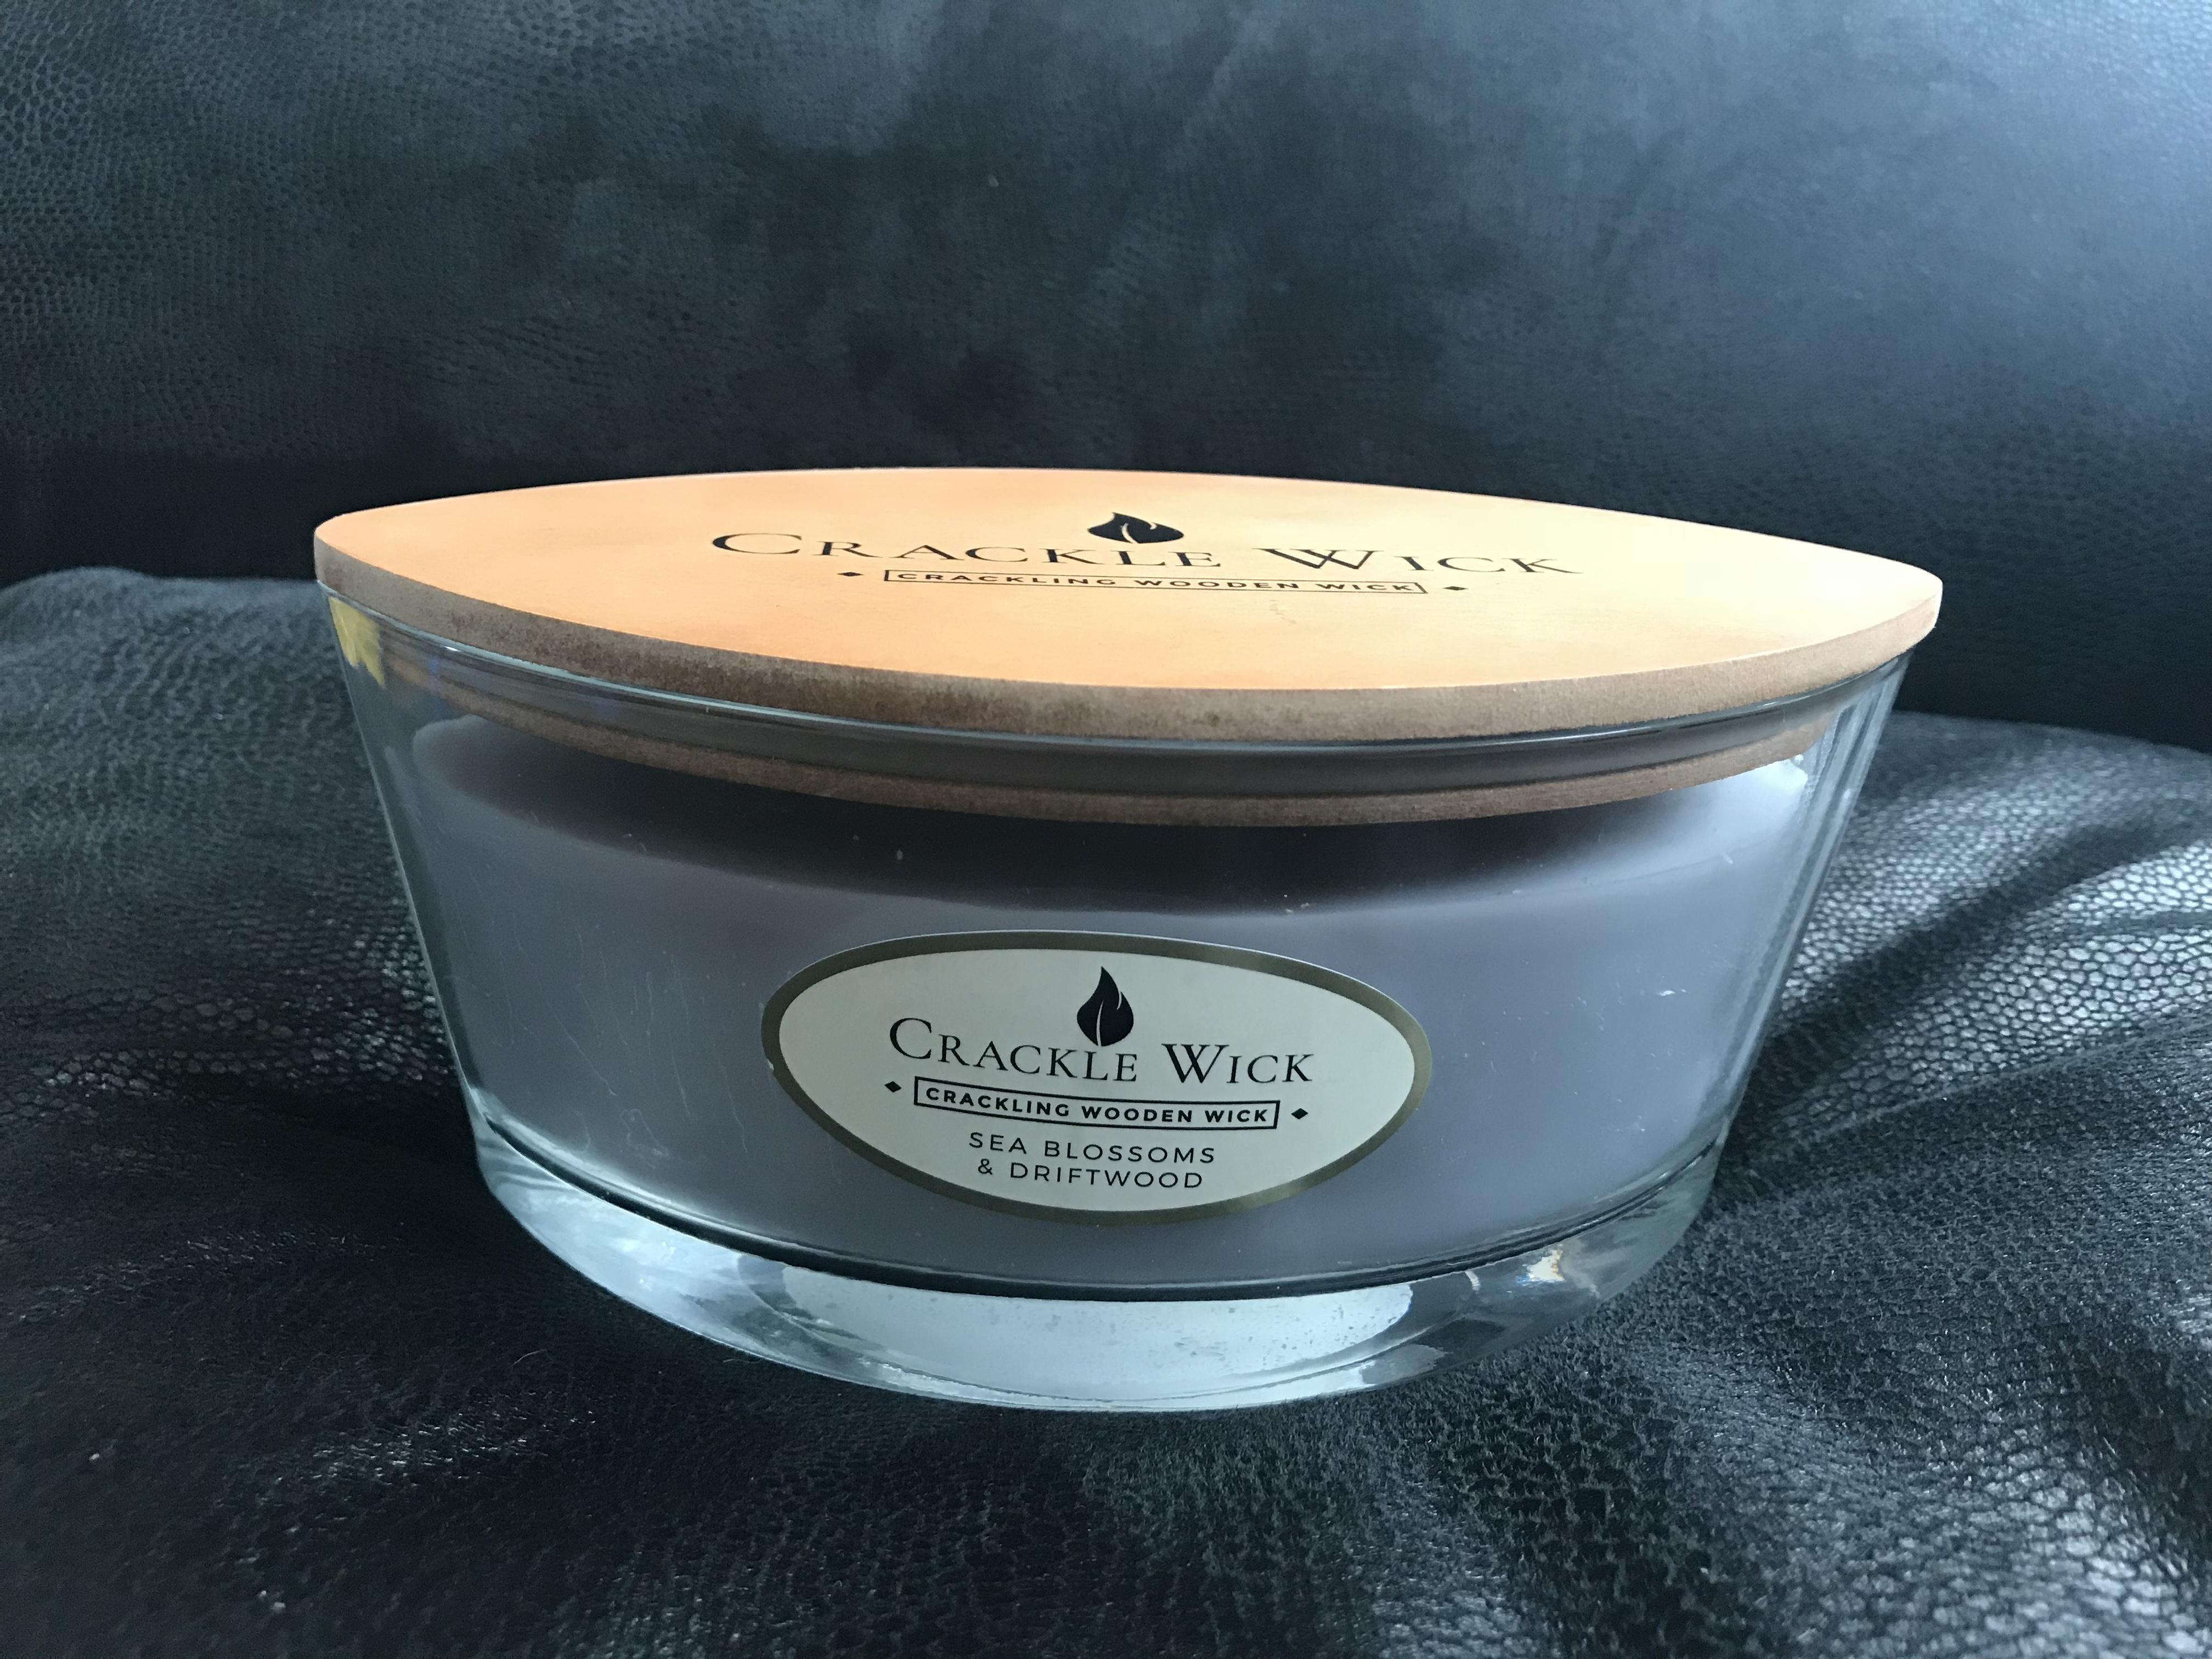 Crackle wick candles (like woodwick) £5.99 @ homebargains